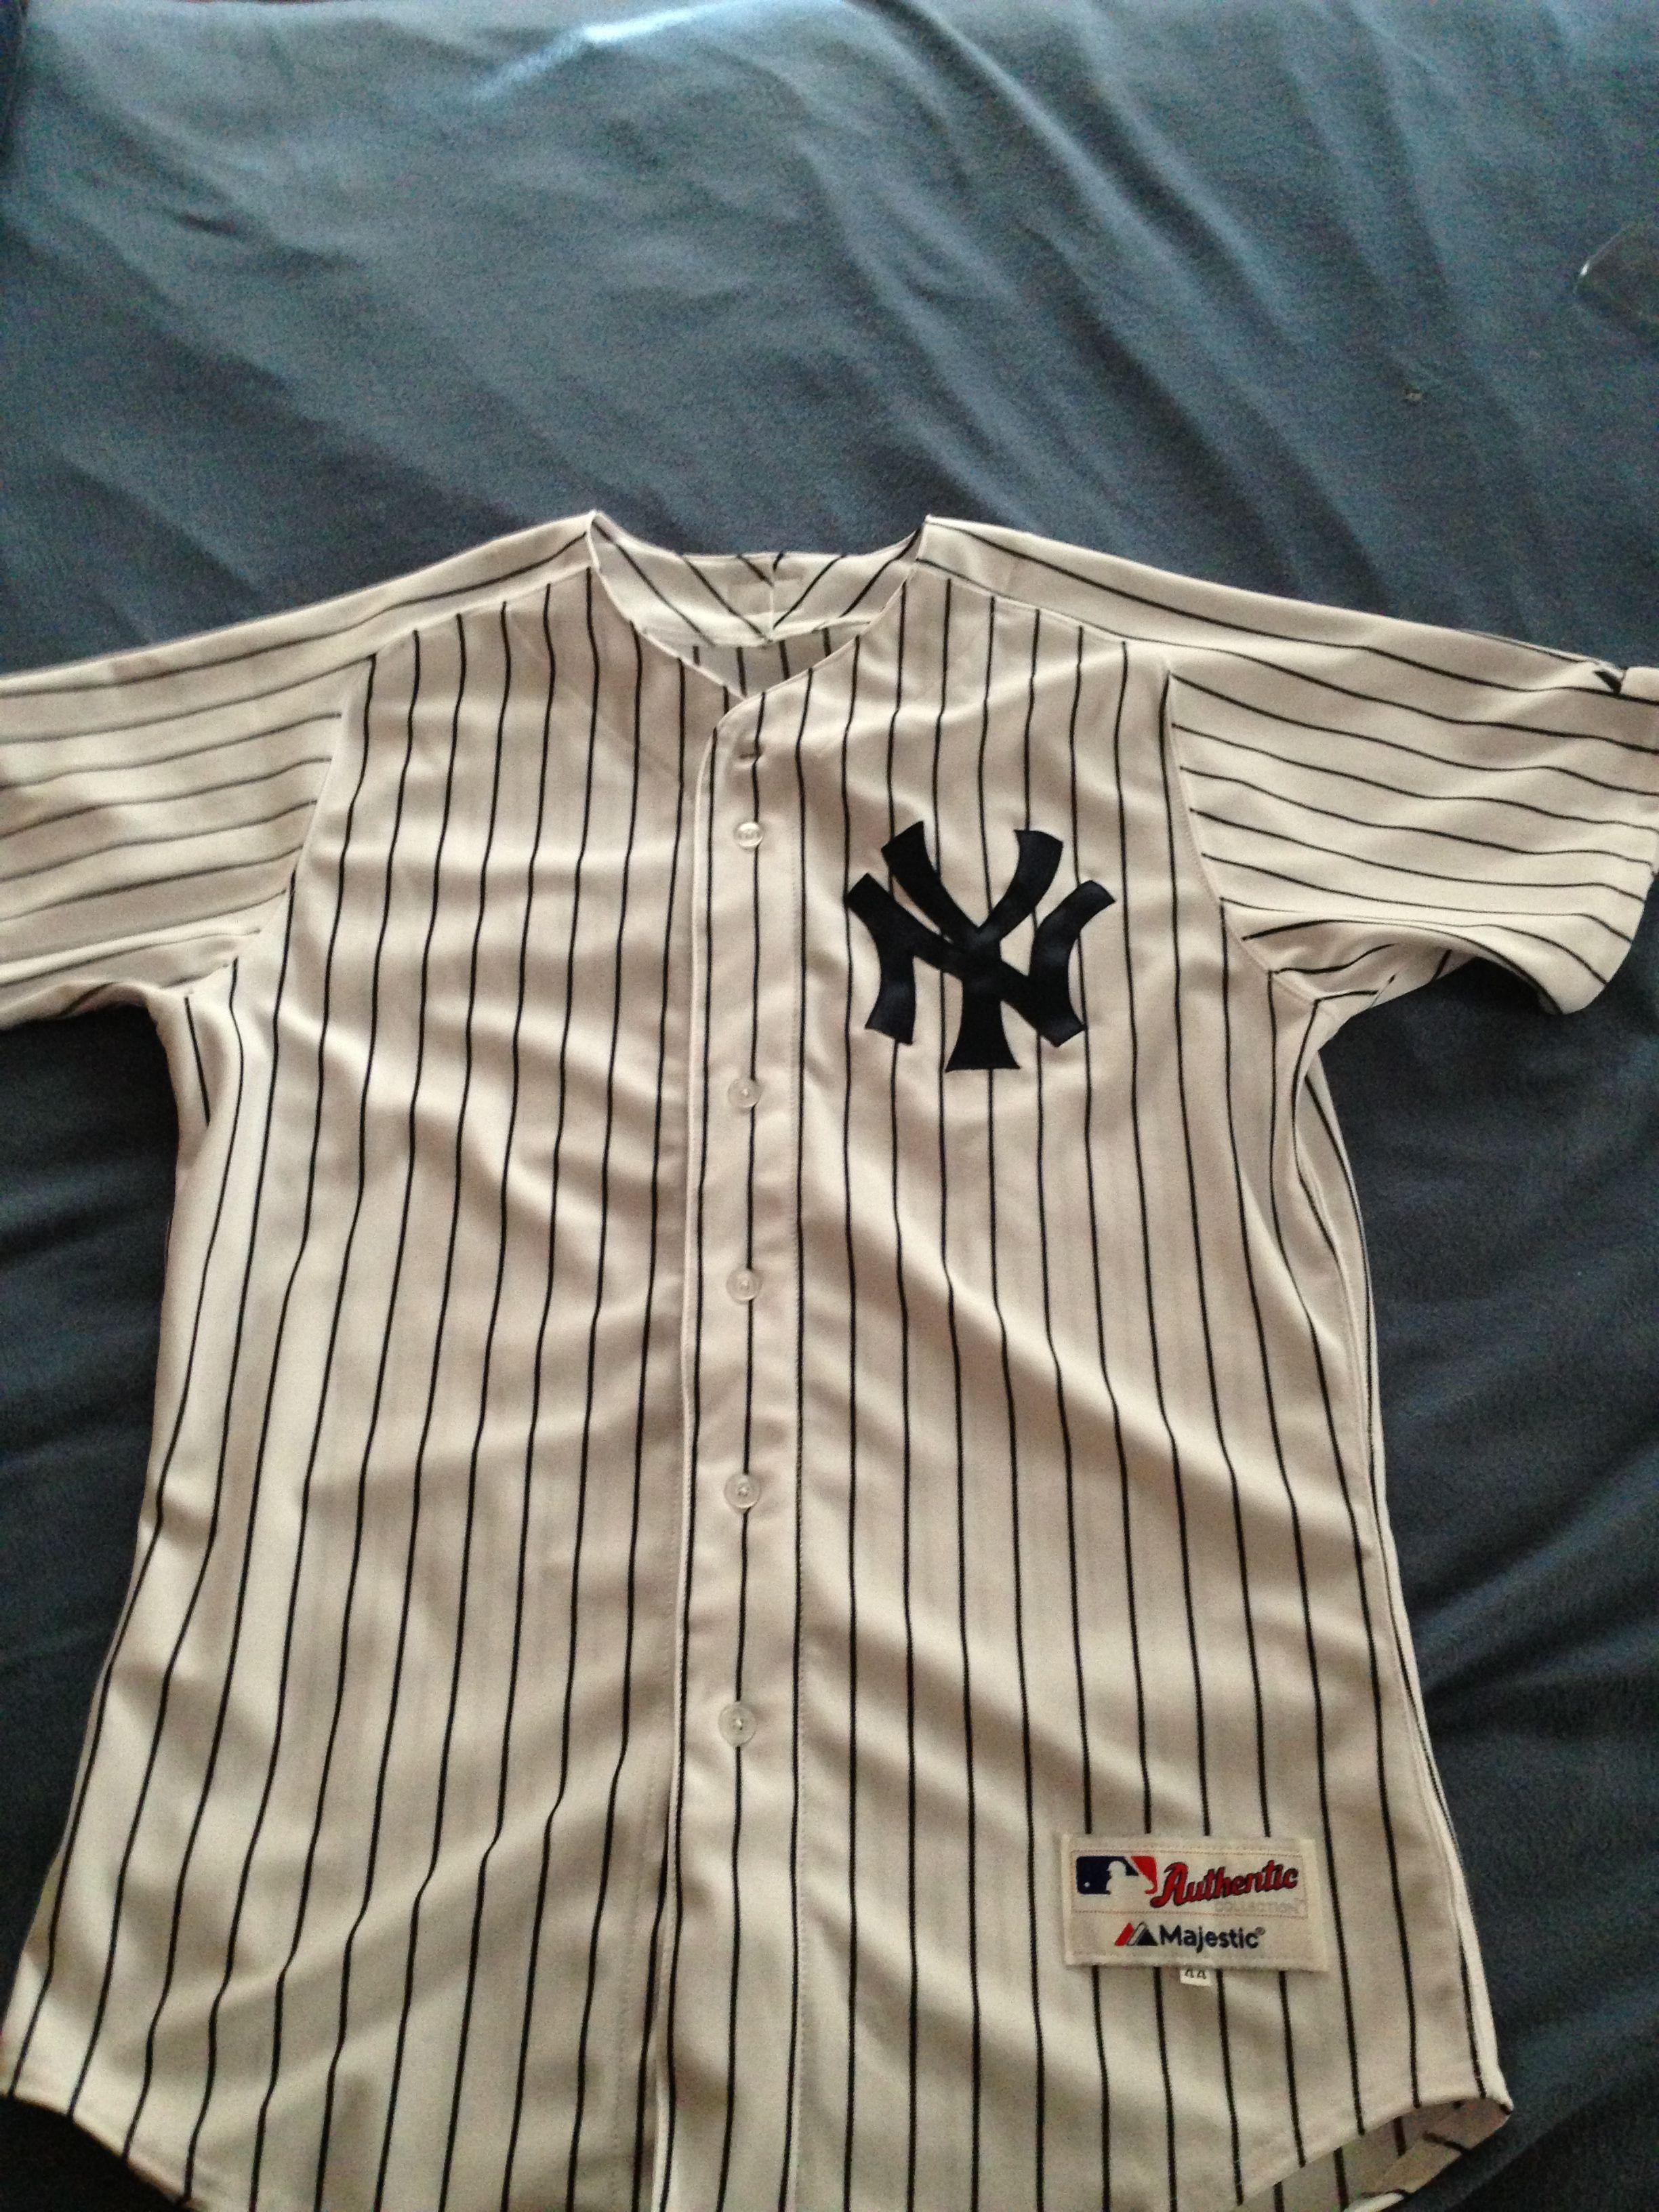 Yankees Jersey!